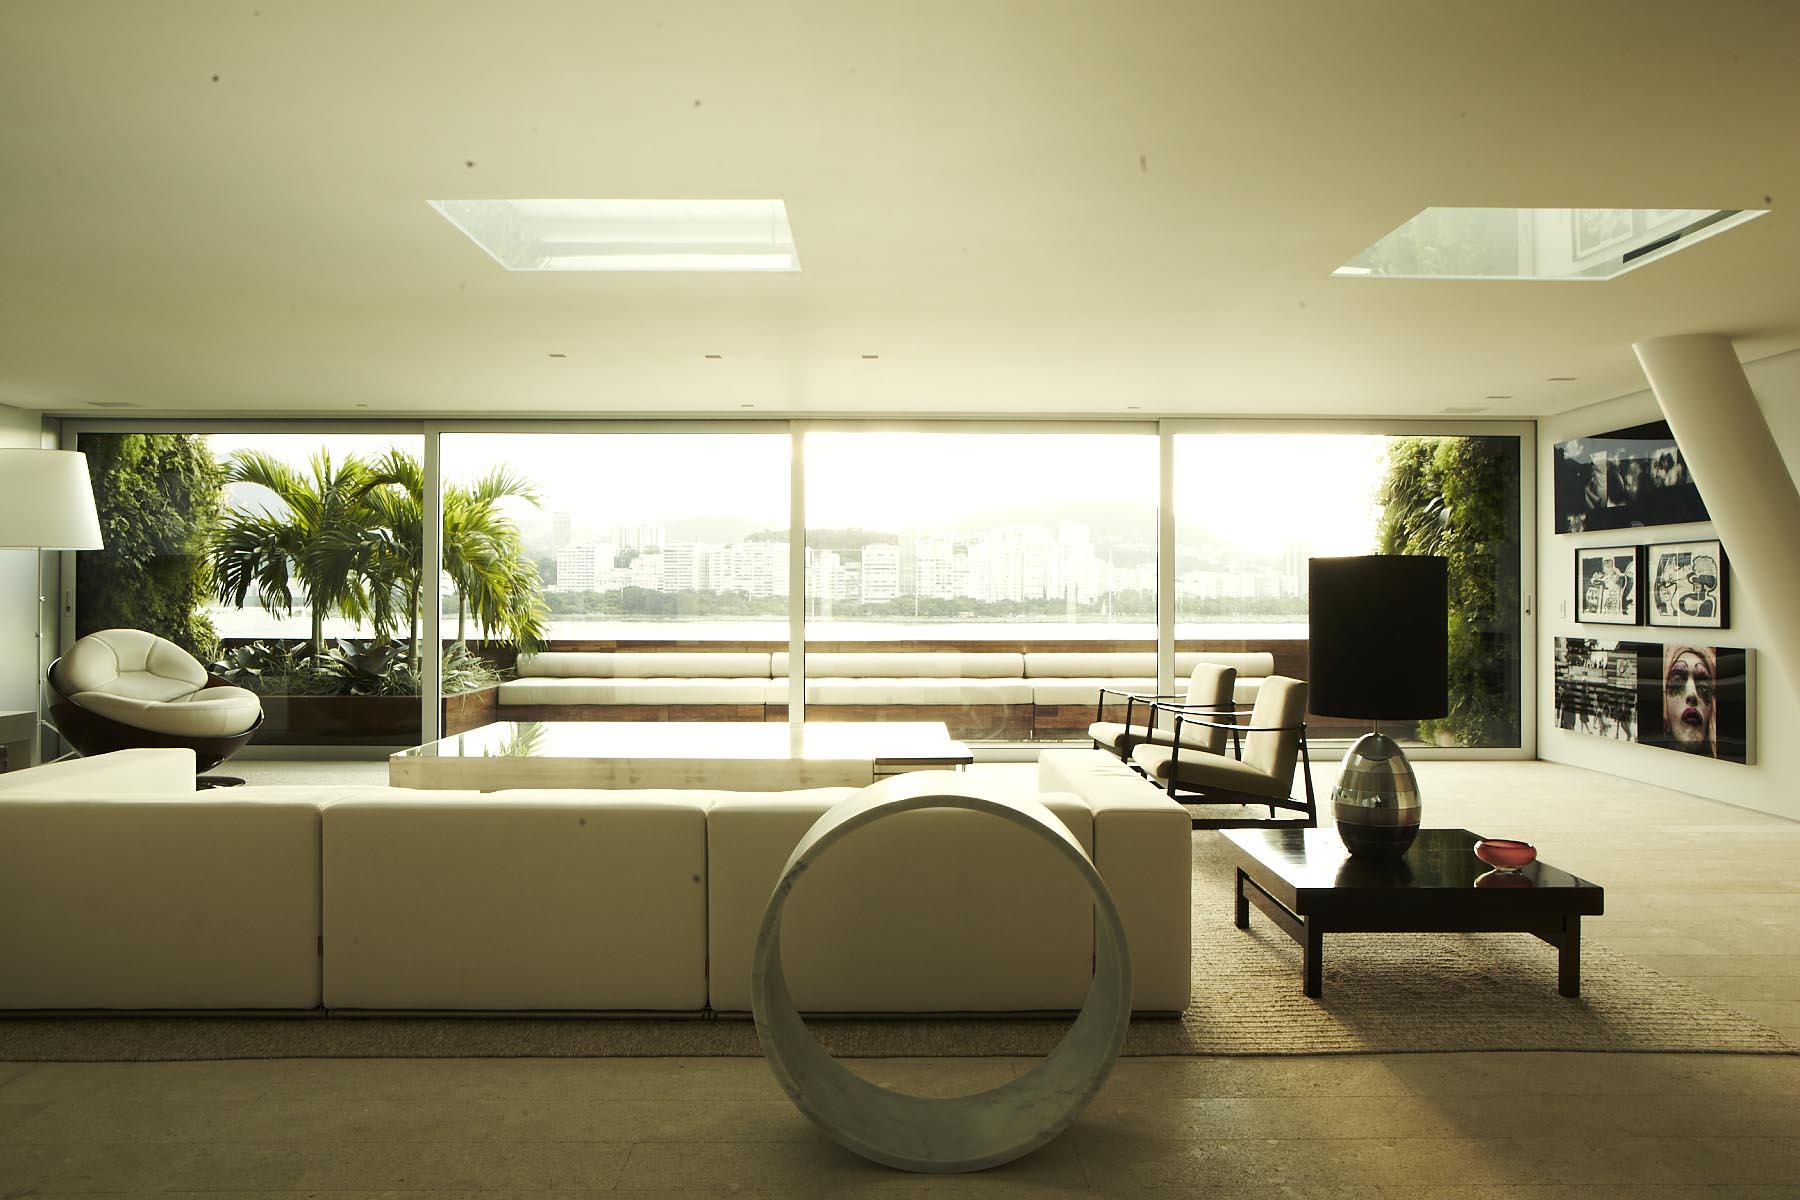 03-2012-os-apartamentos-vencedores-do-premio-casa-claudia-design-de-interiores